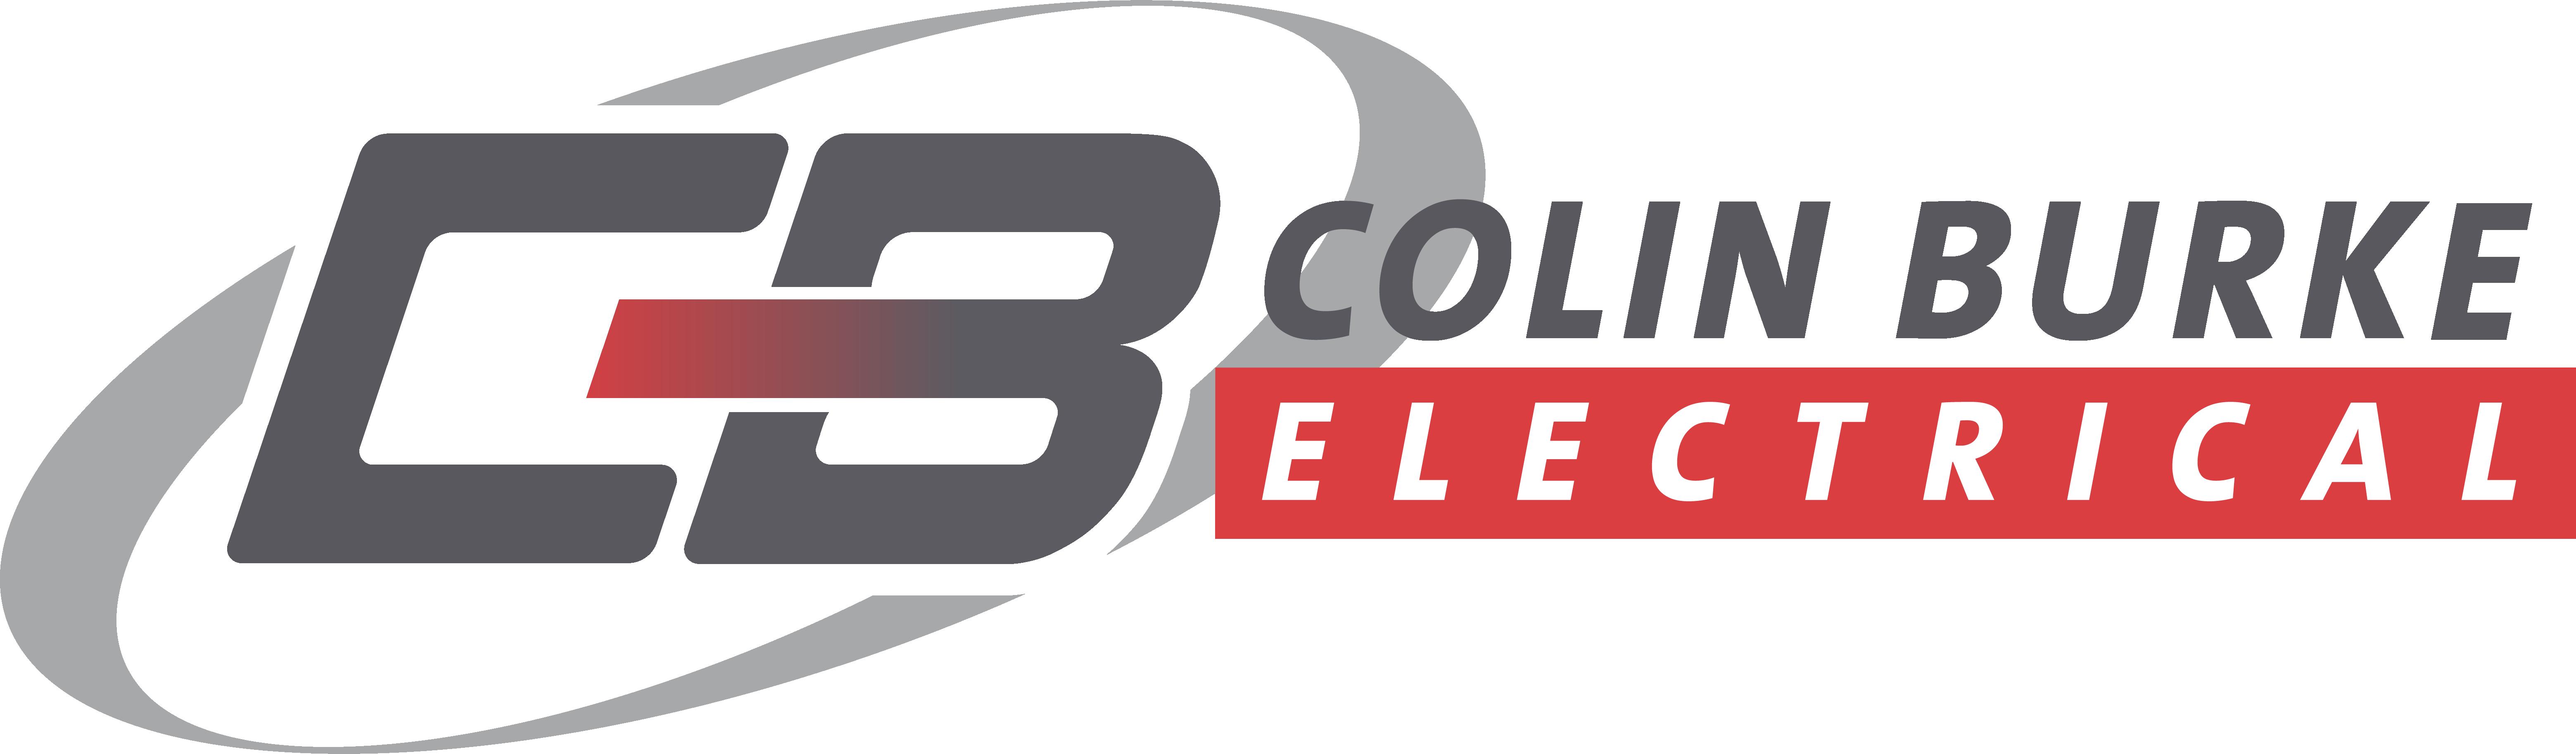 Colin Burke Electrical